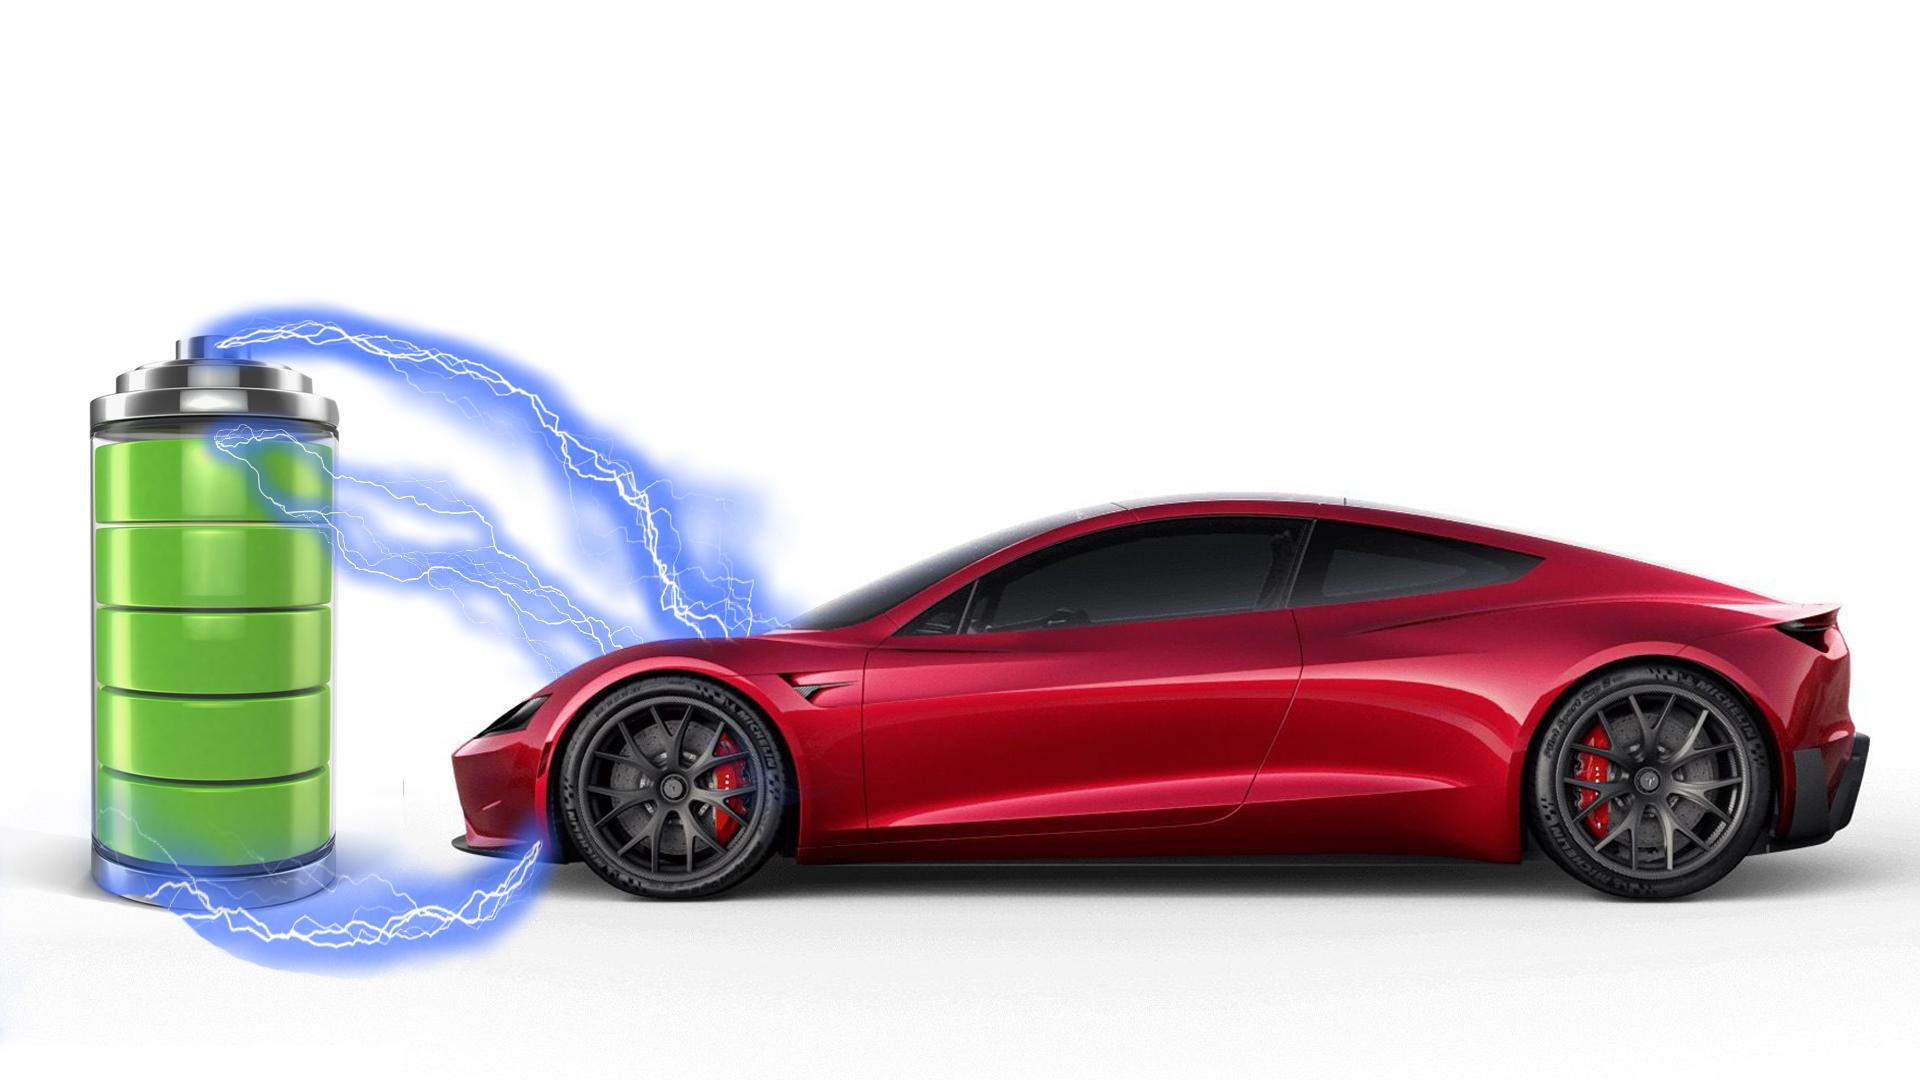 electrified-reviews-tesla-roadster-prototype-electric-bike-battery-hero.jpg